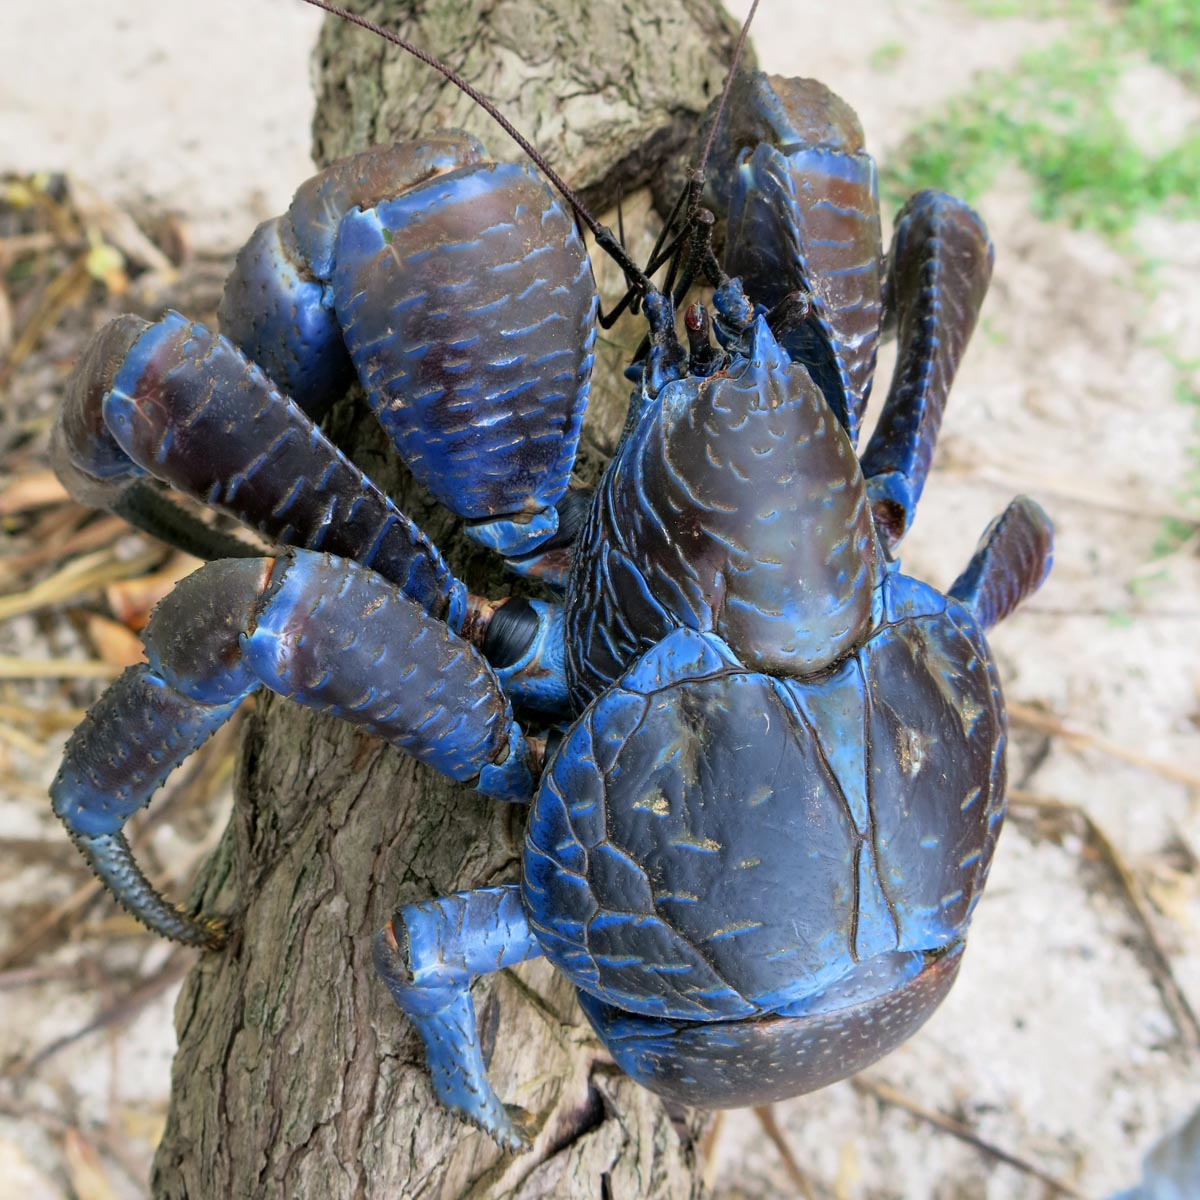 Coconut Crab HD wallpapers, Desktop wallpaper - most viewed